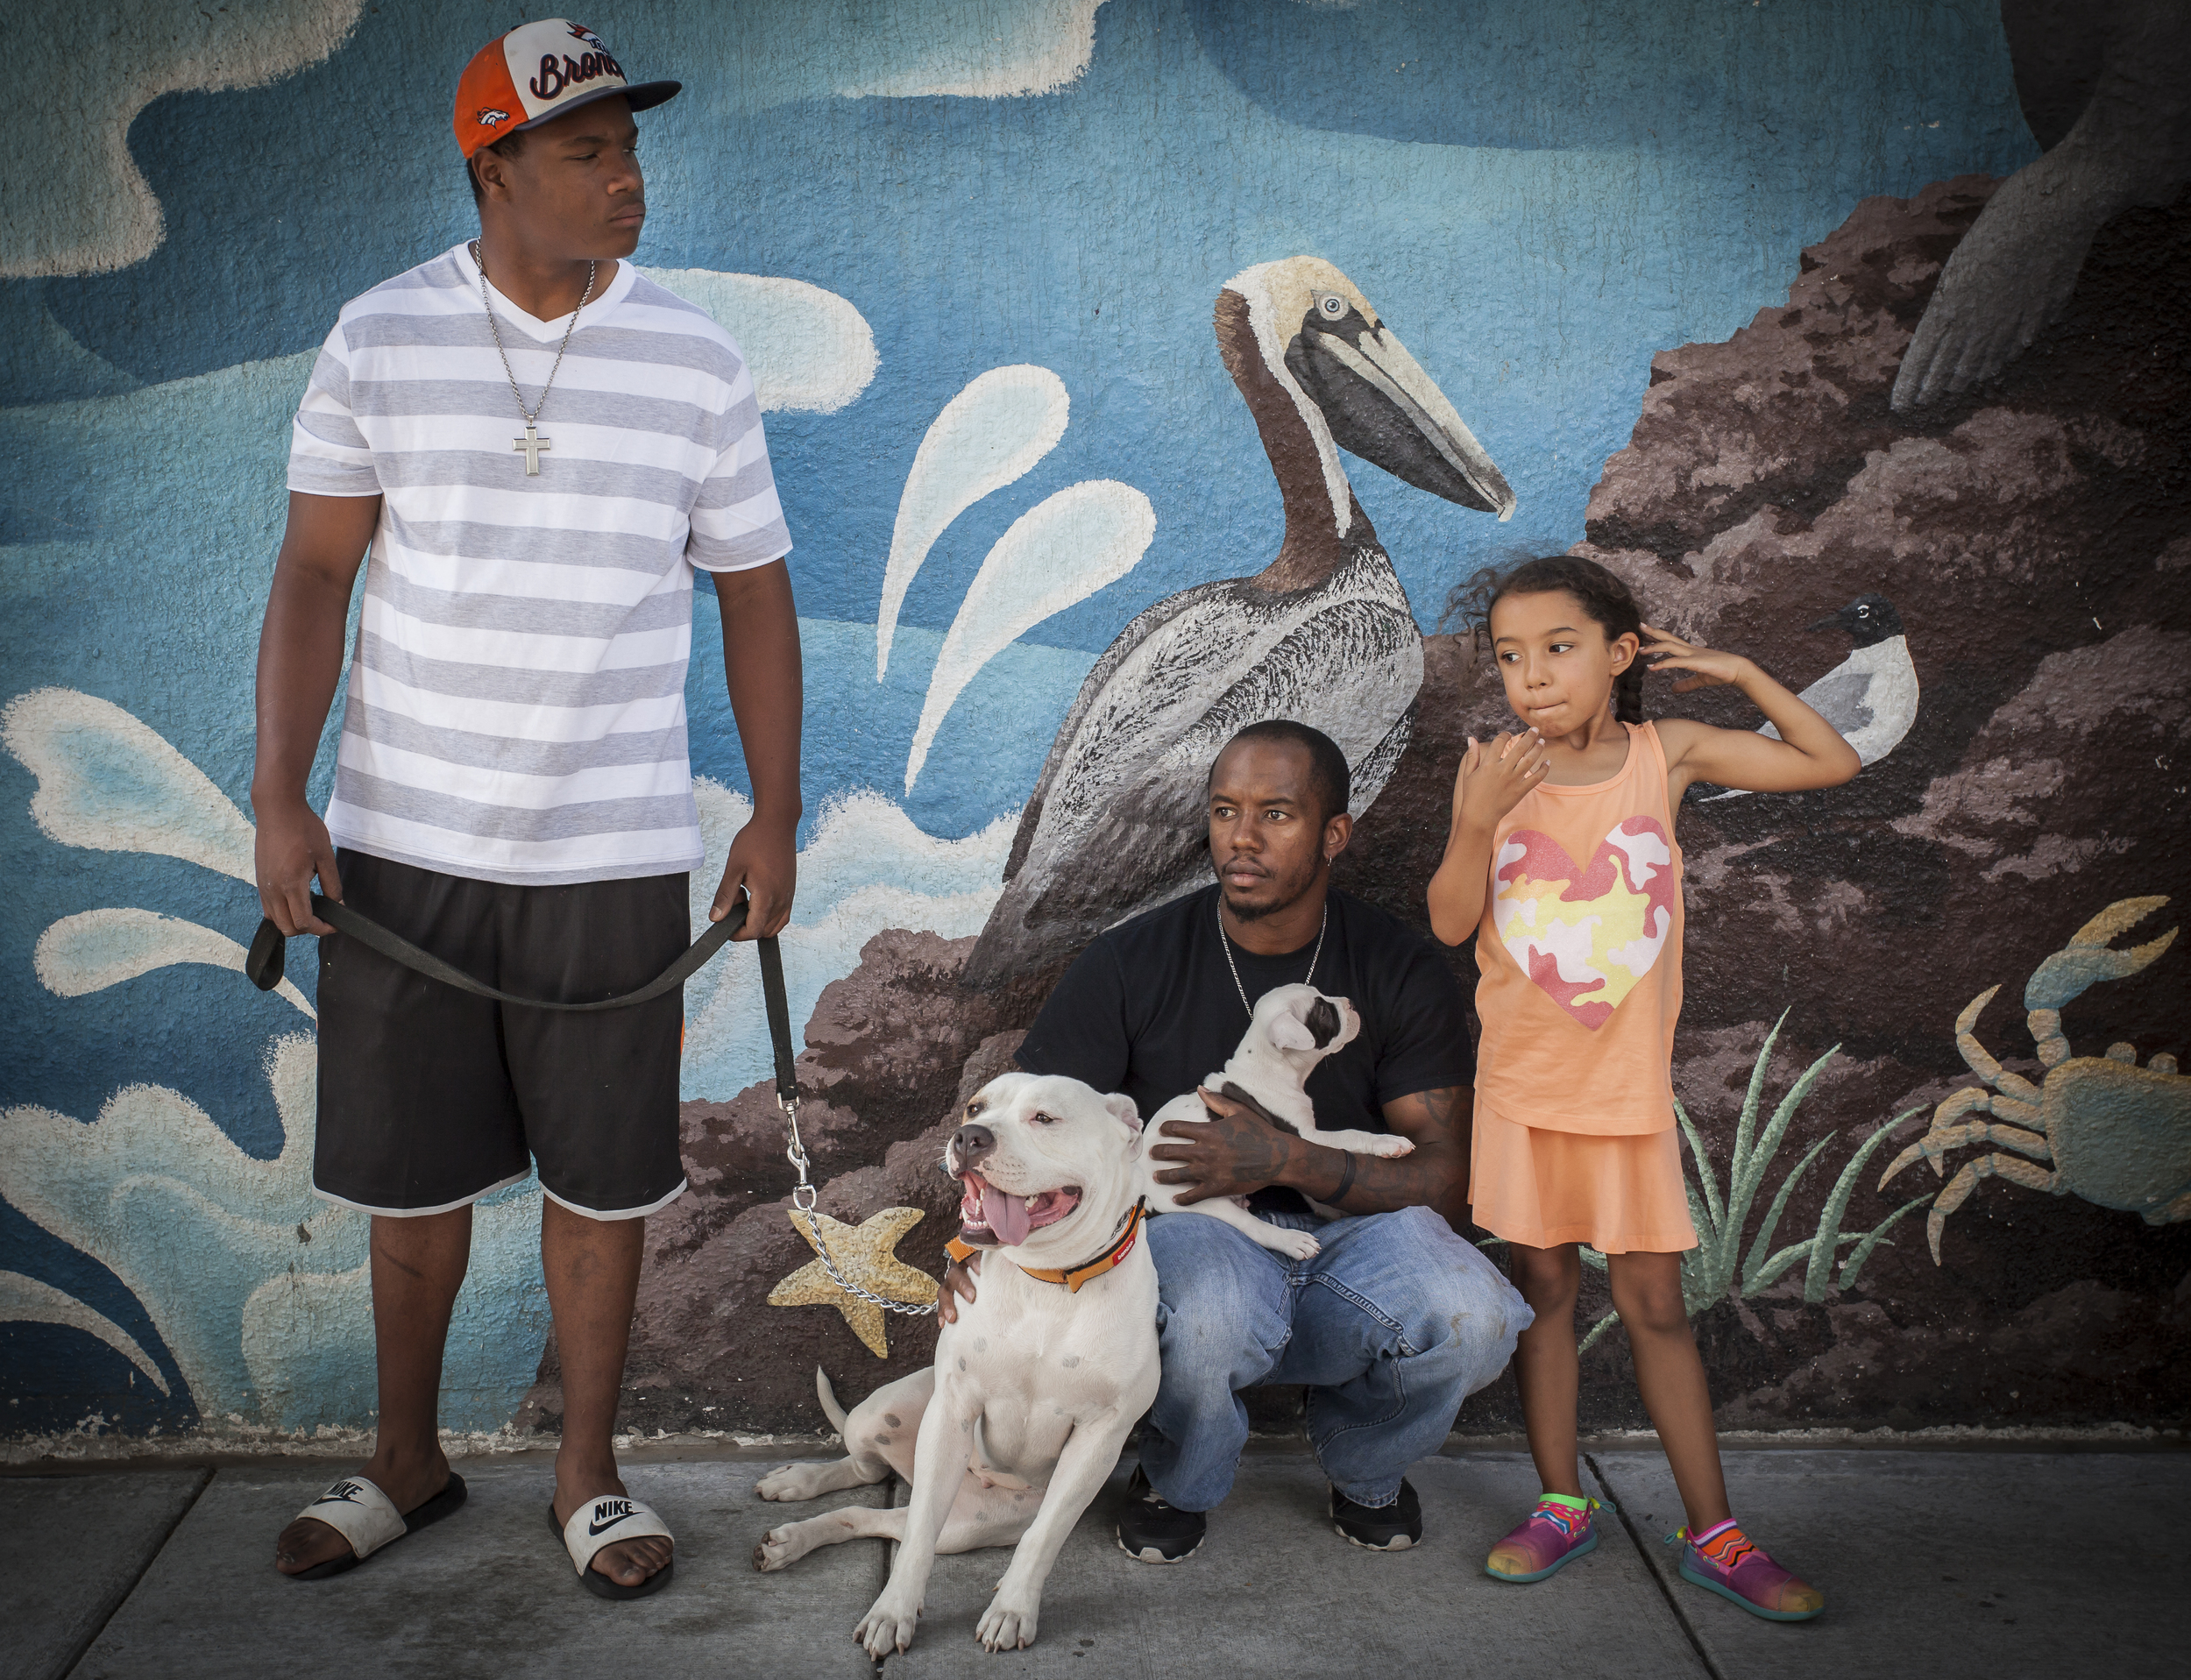 pitbull family 11.5x15-1.jpg